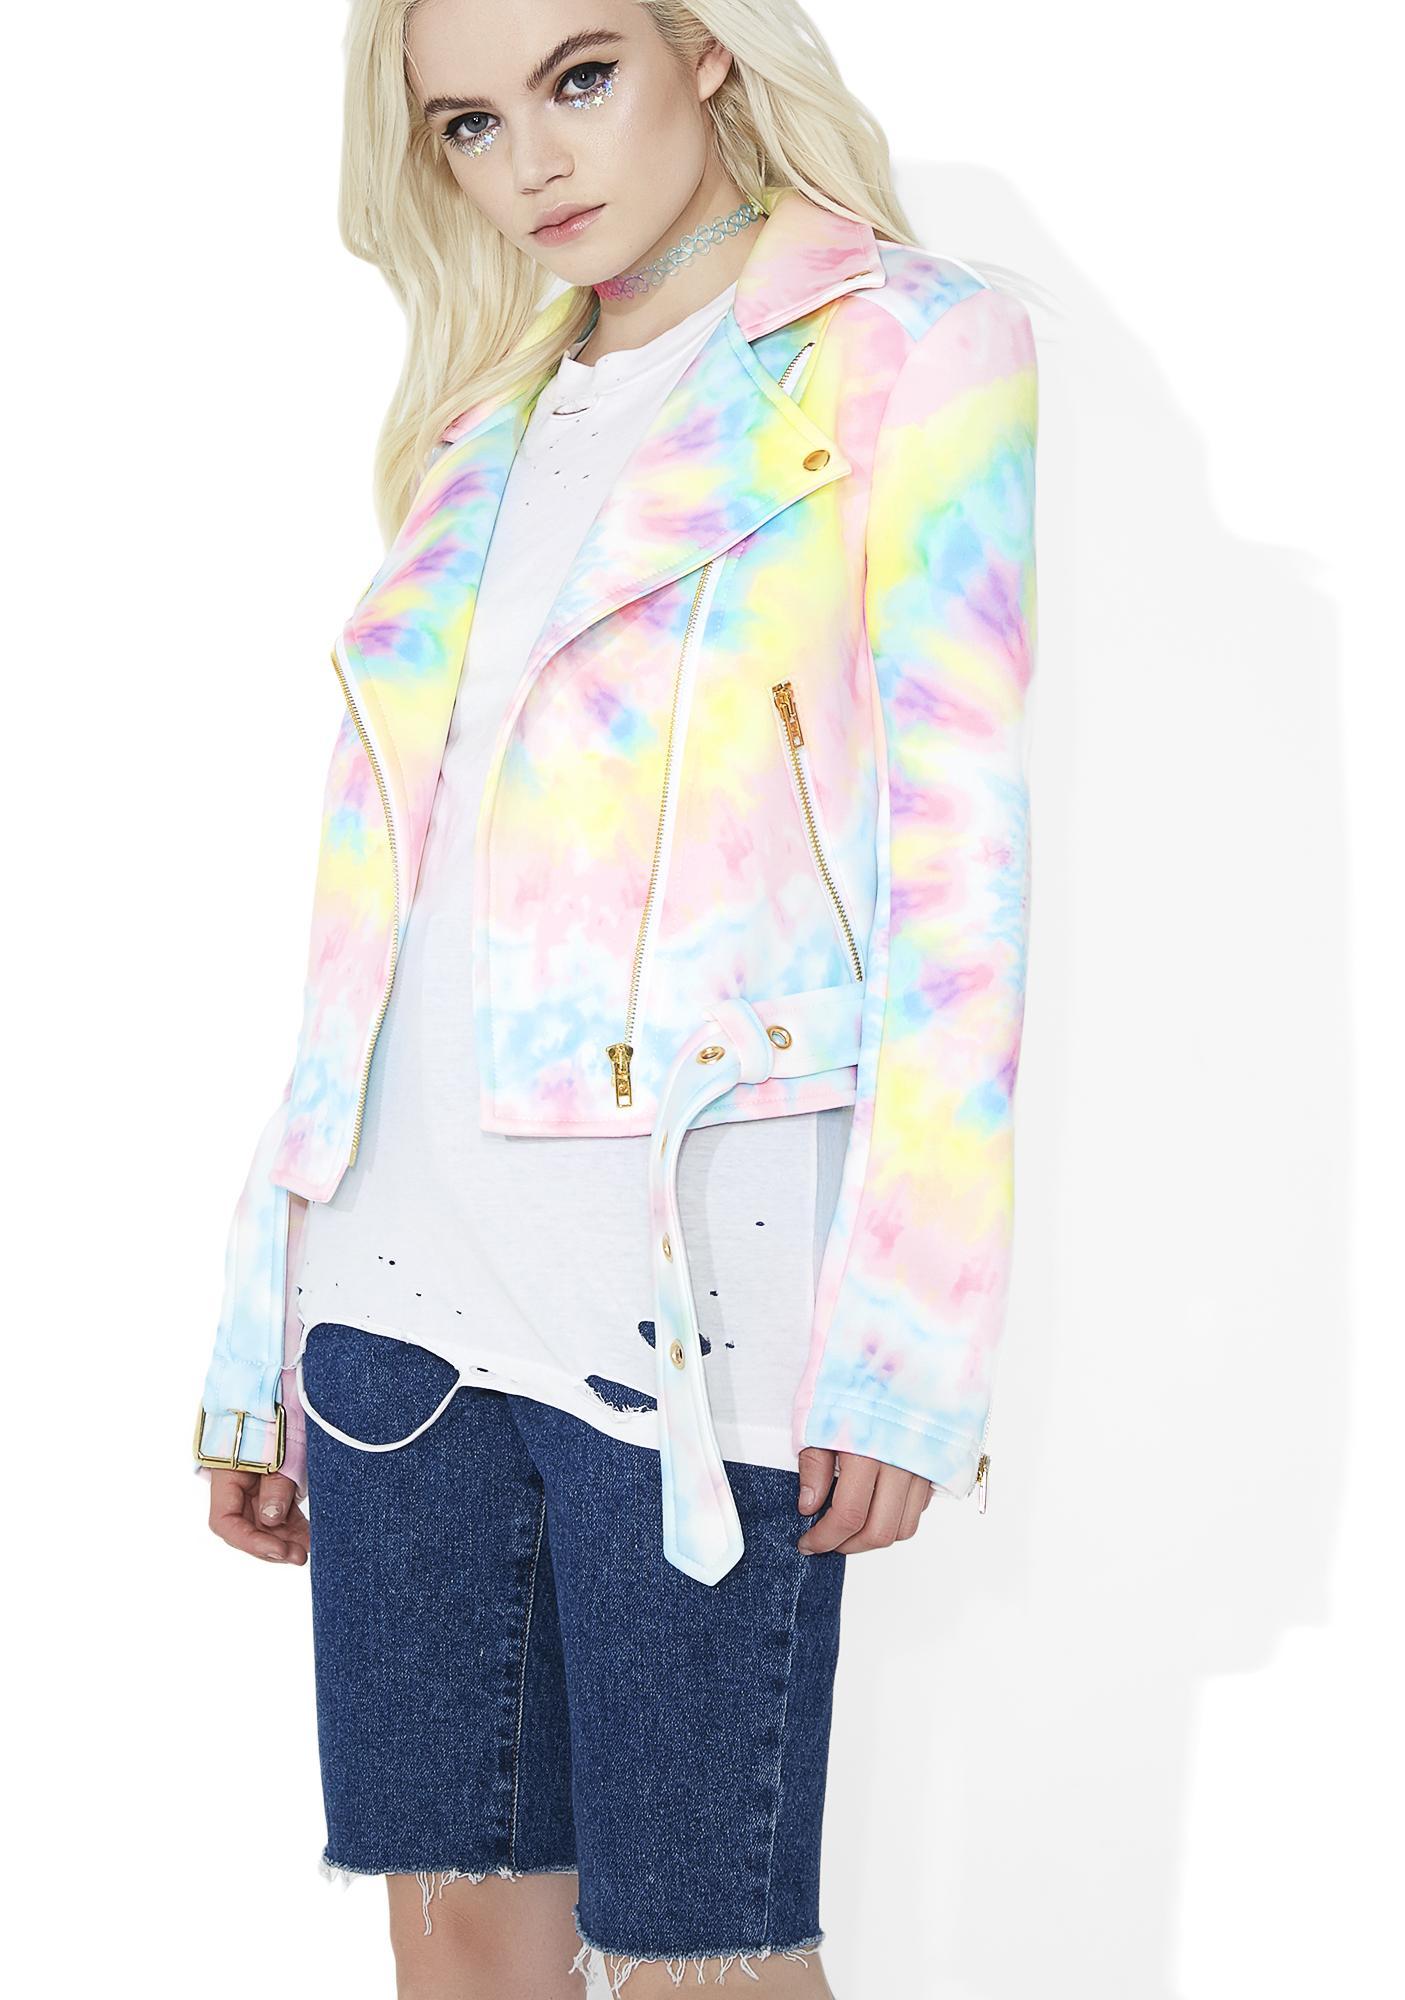 Sugarpills Tie Dye Moto Jacket